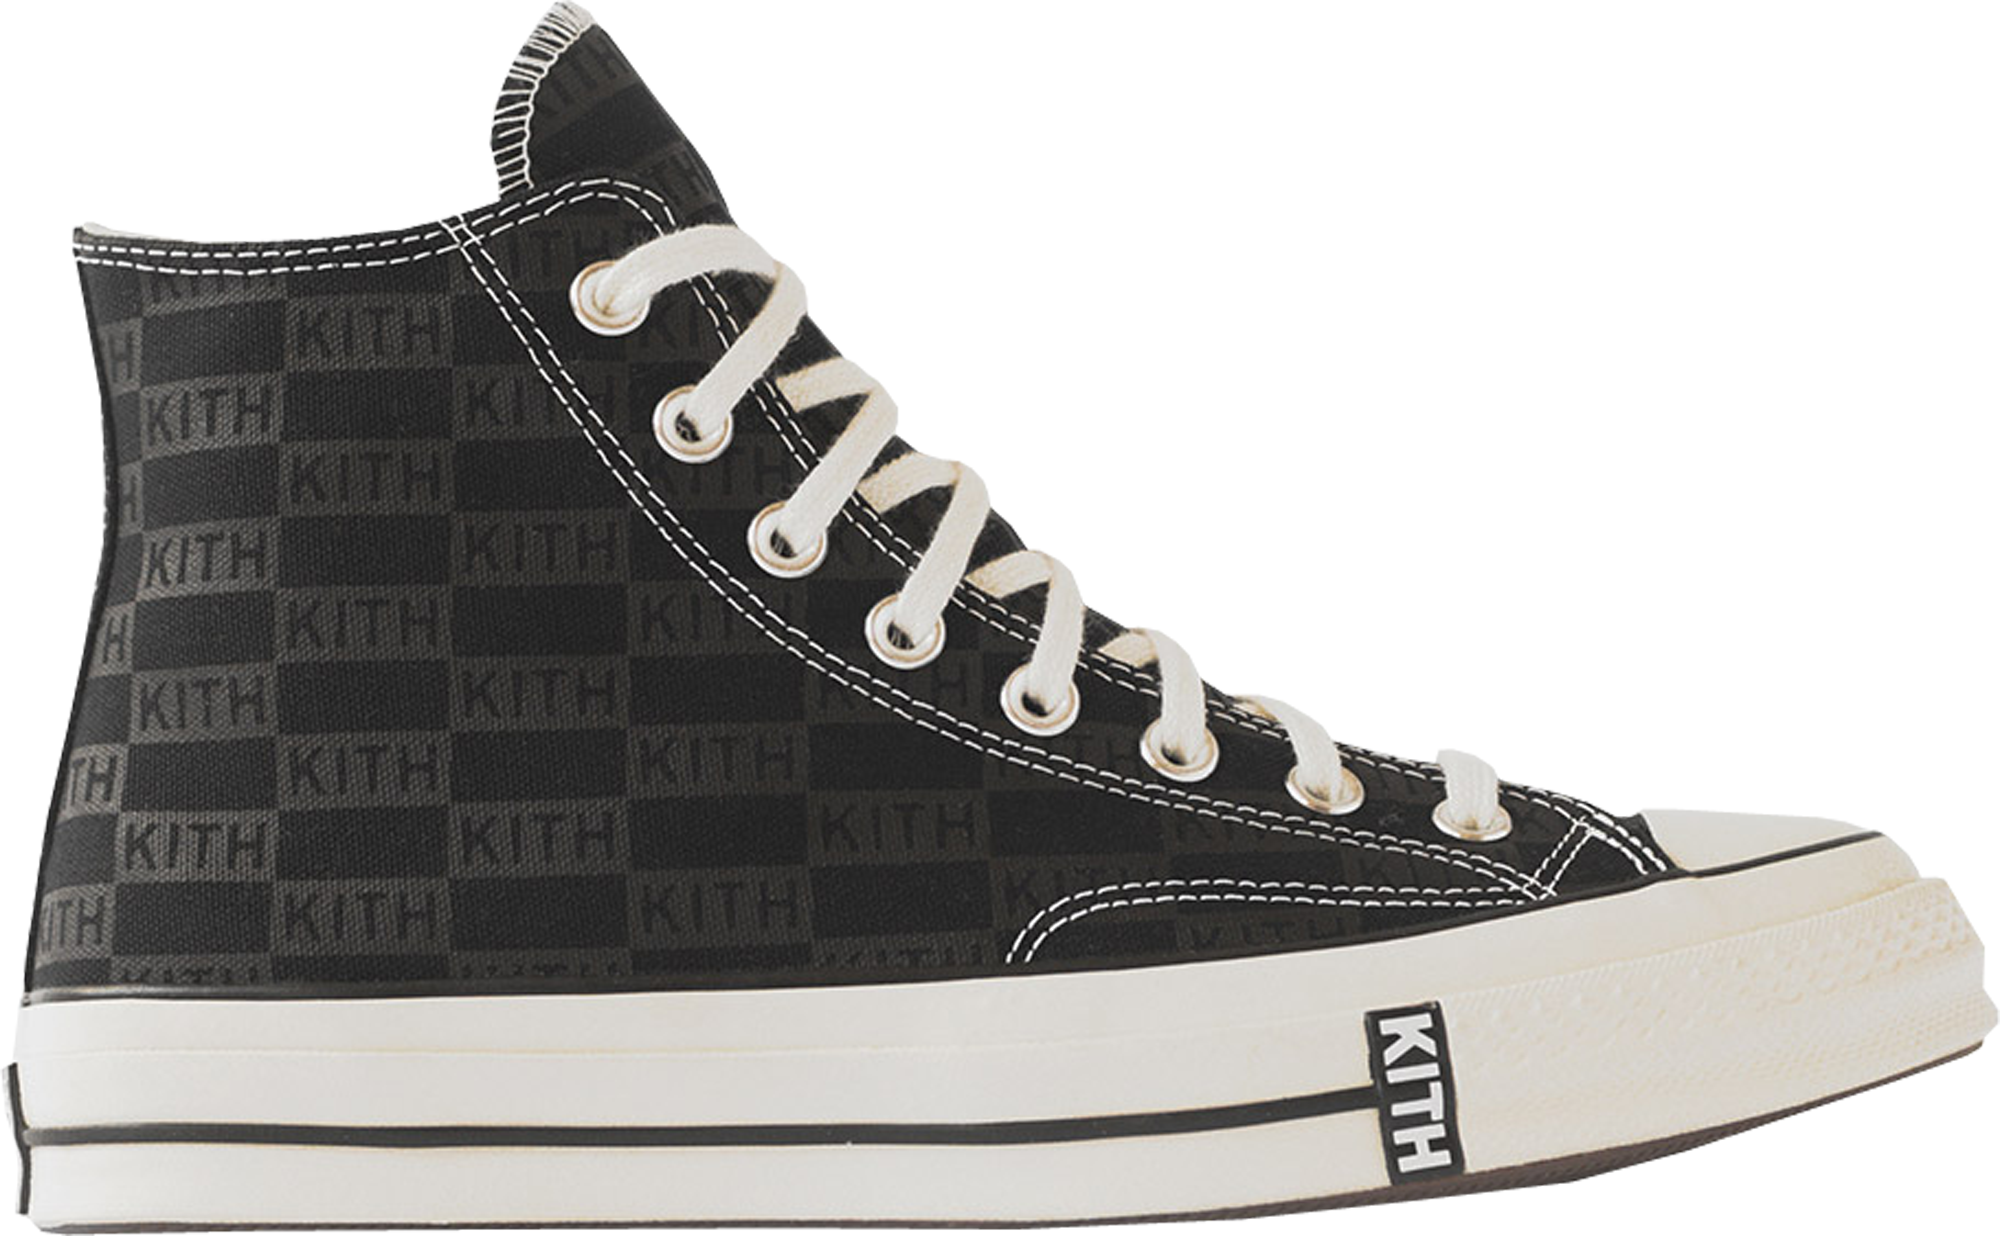 Converse Chuck Taylor All-Star 70s Hi Kith Classics Black